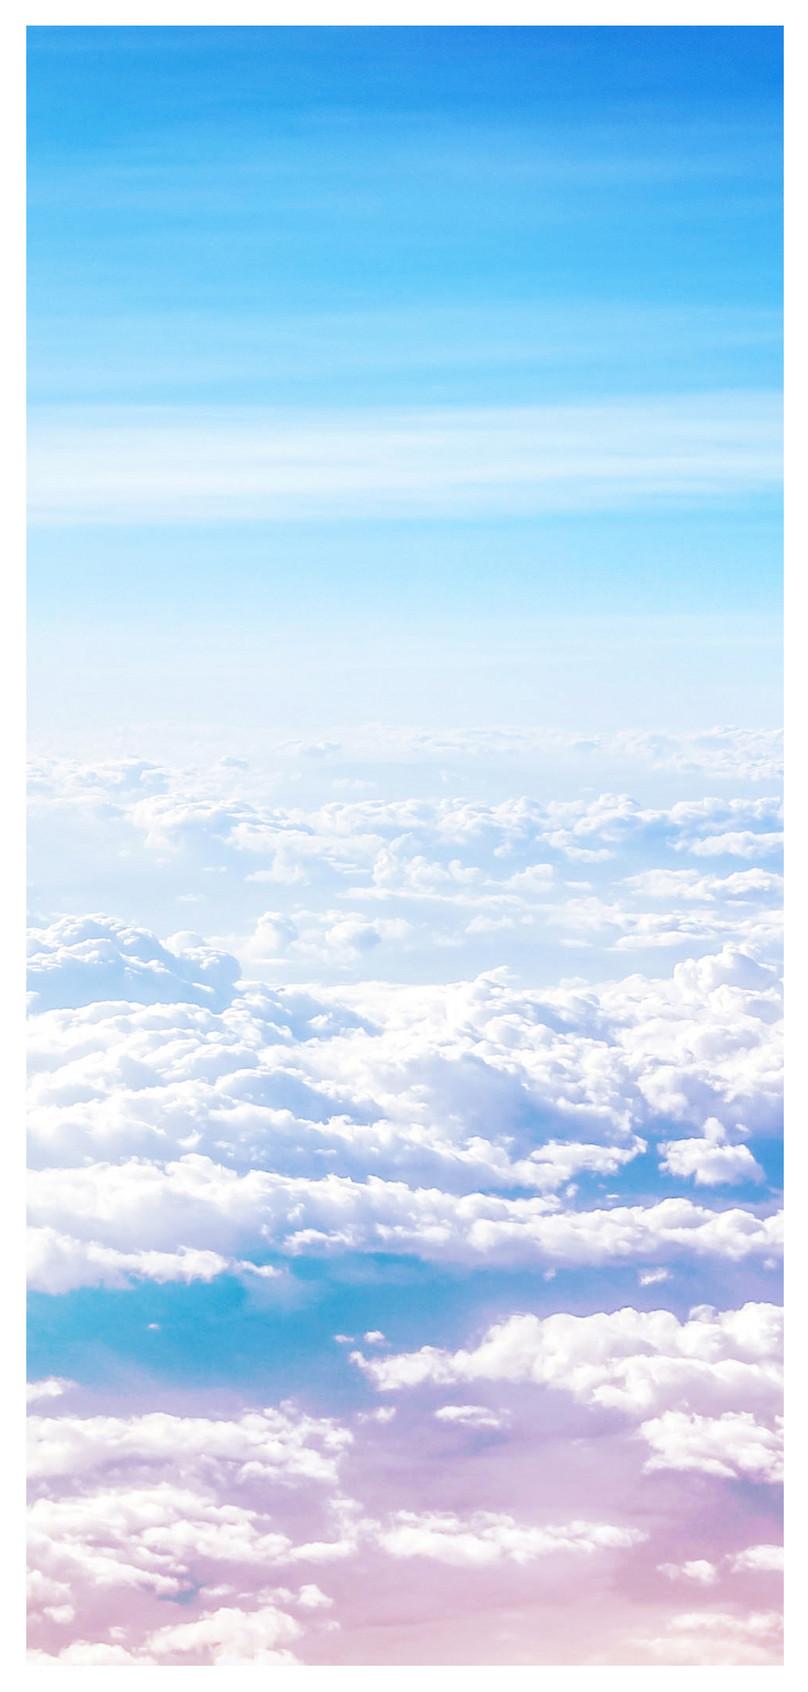 wallpaper awan,sky,blue,white,cloud,daytime,atmosphere,calm ...